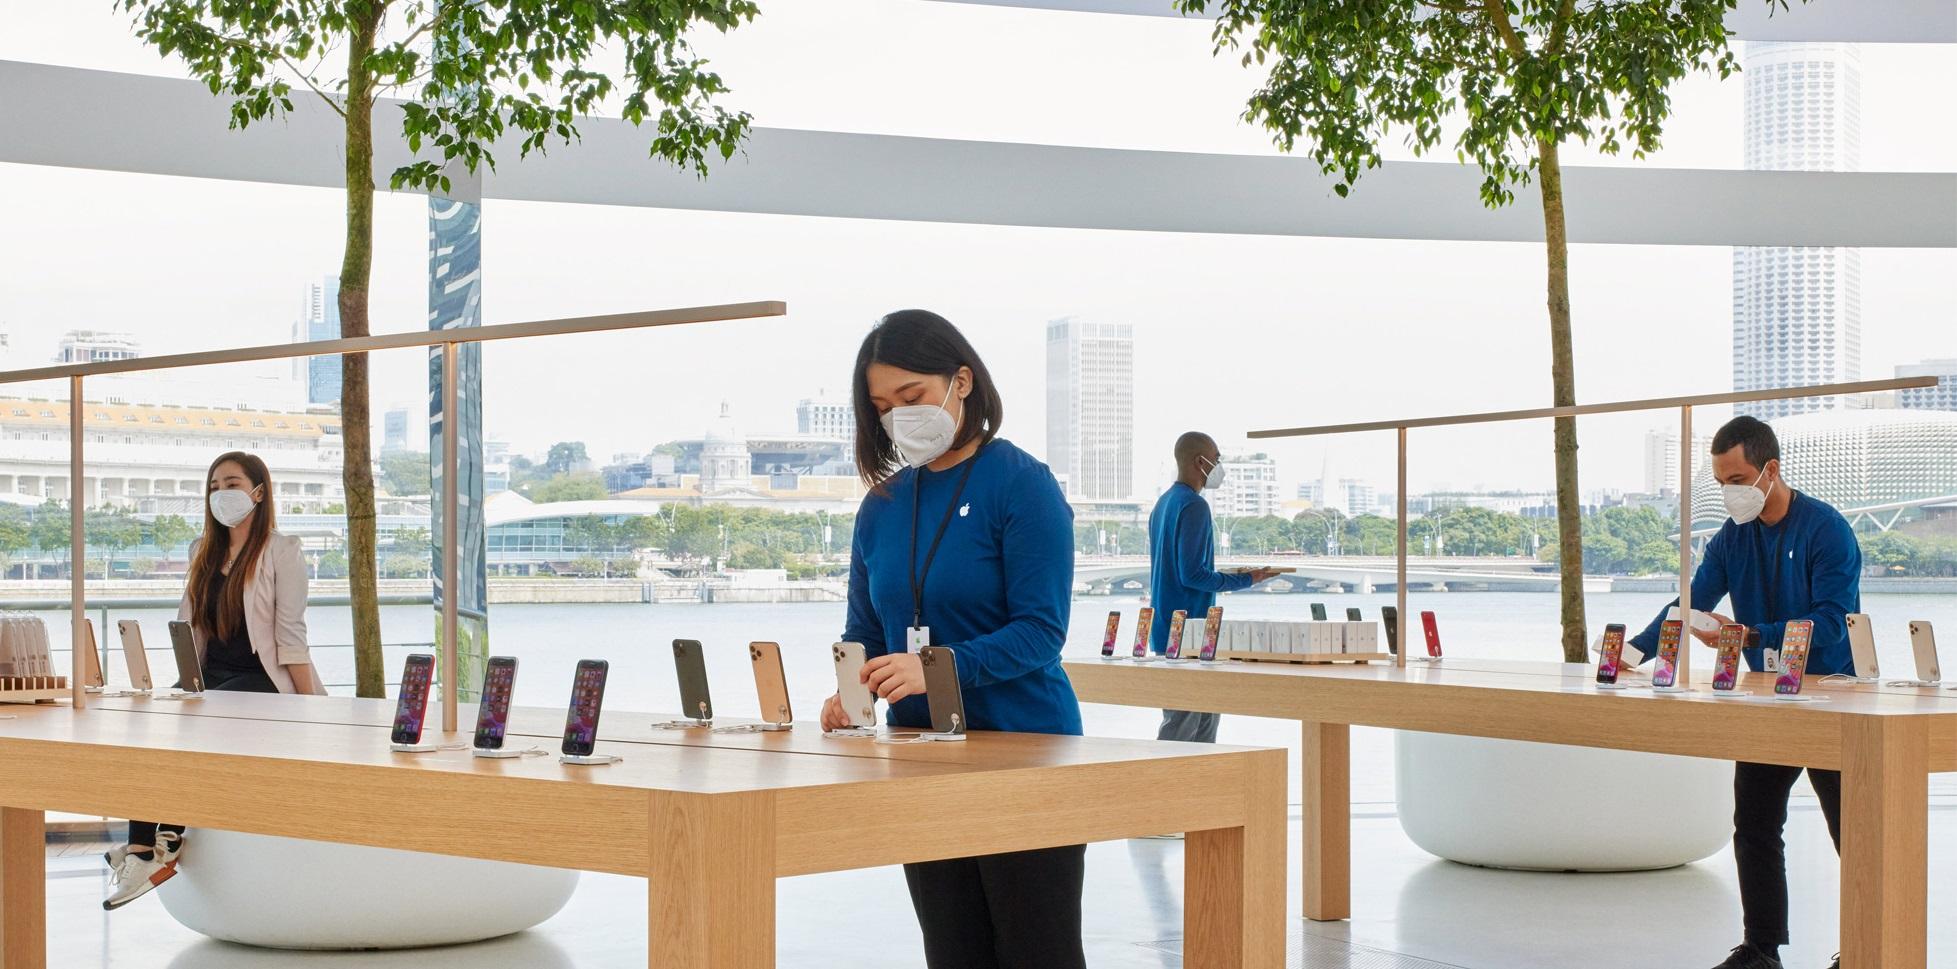 apple-store-smartphone-sales-cut